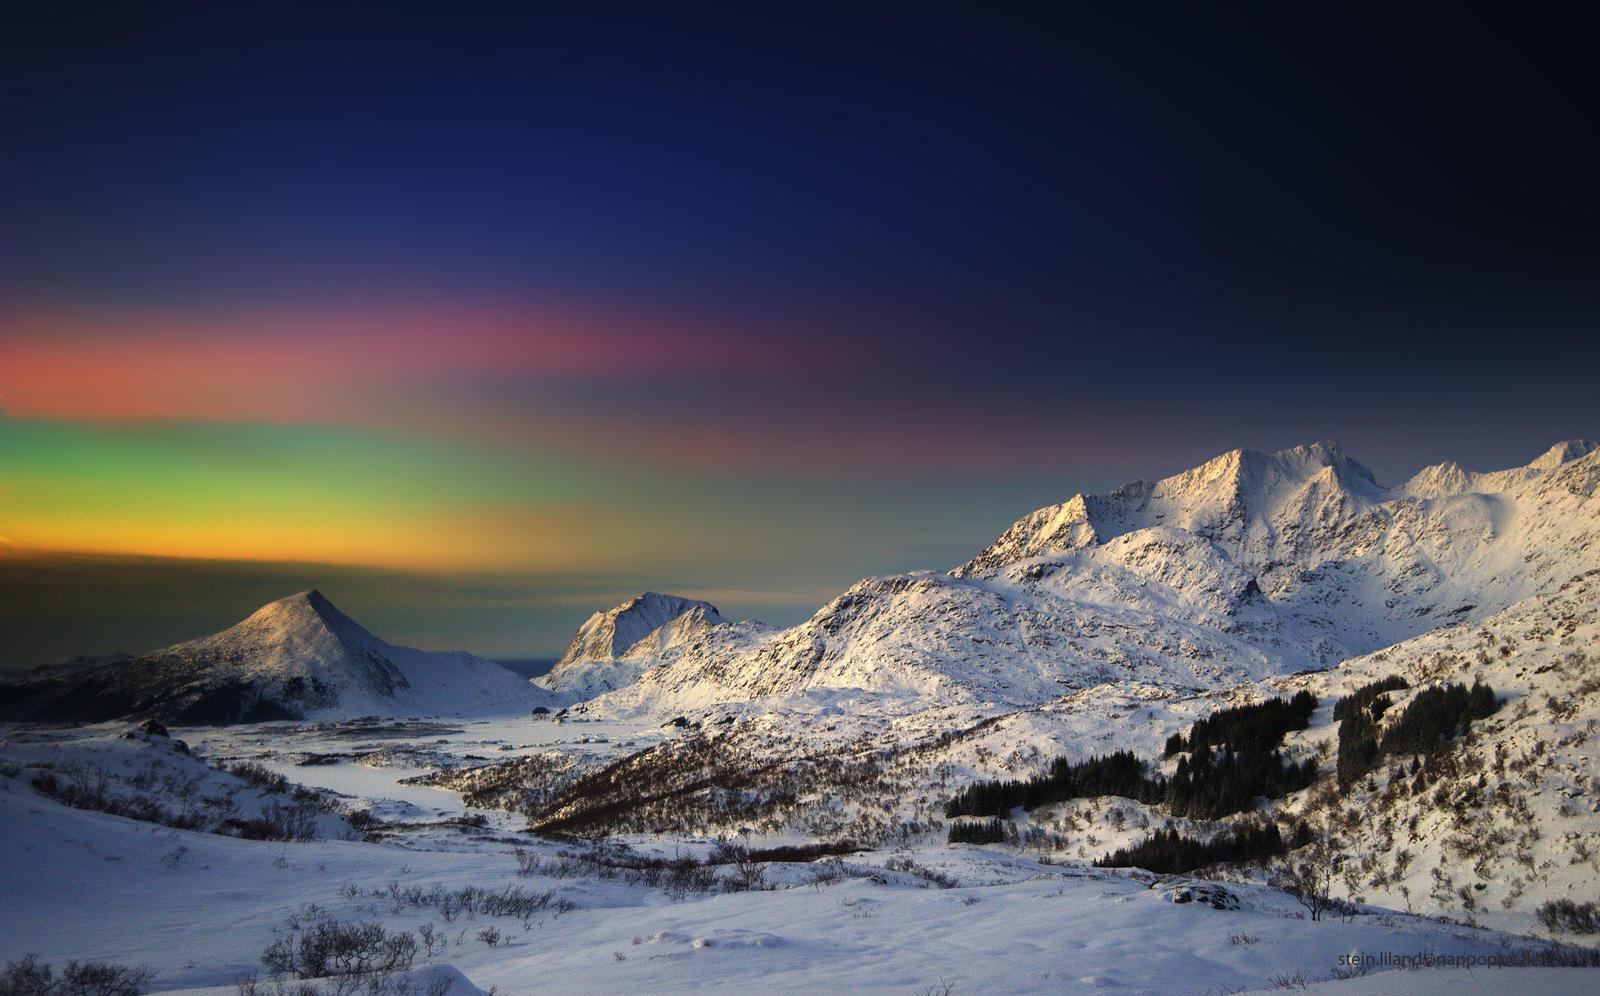 http://fc02.deviantart.net/fs71/i/2011/020/8/c/wintermoods_in_lofoten_by_steinliland-d37mrk0.jpg